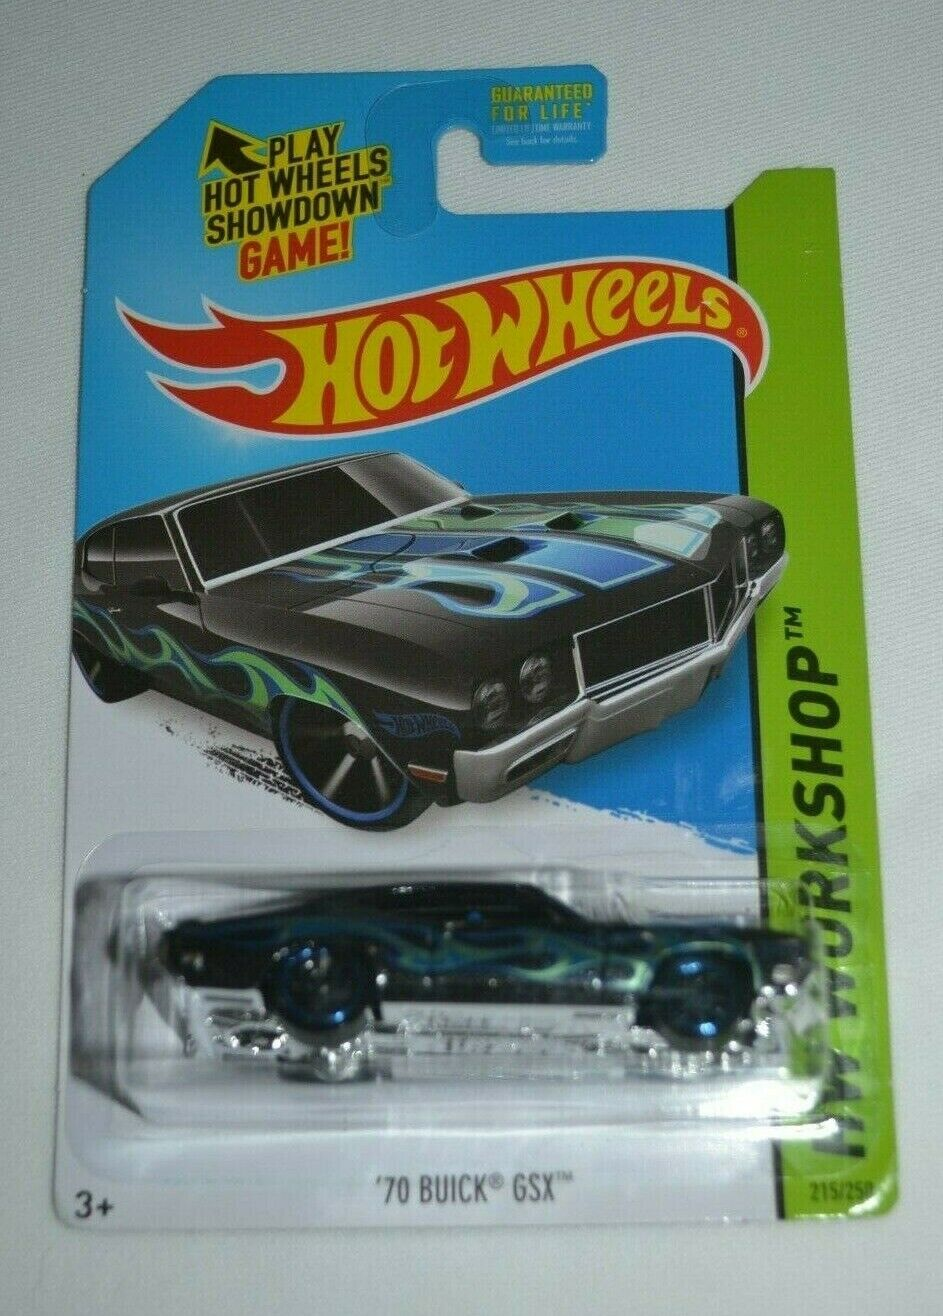 70 Buick GSX HW Workshop  Hot Wheels